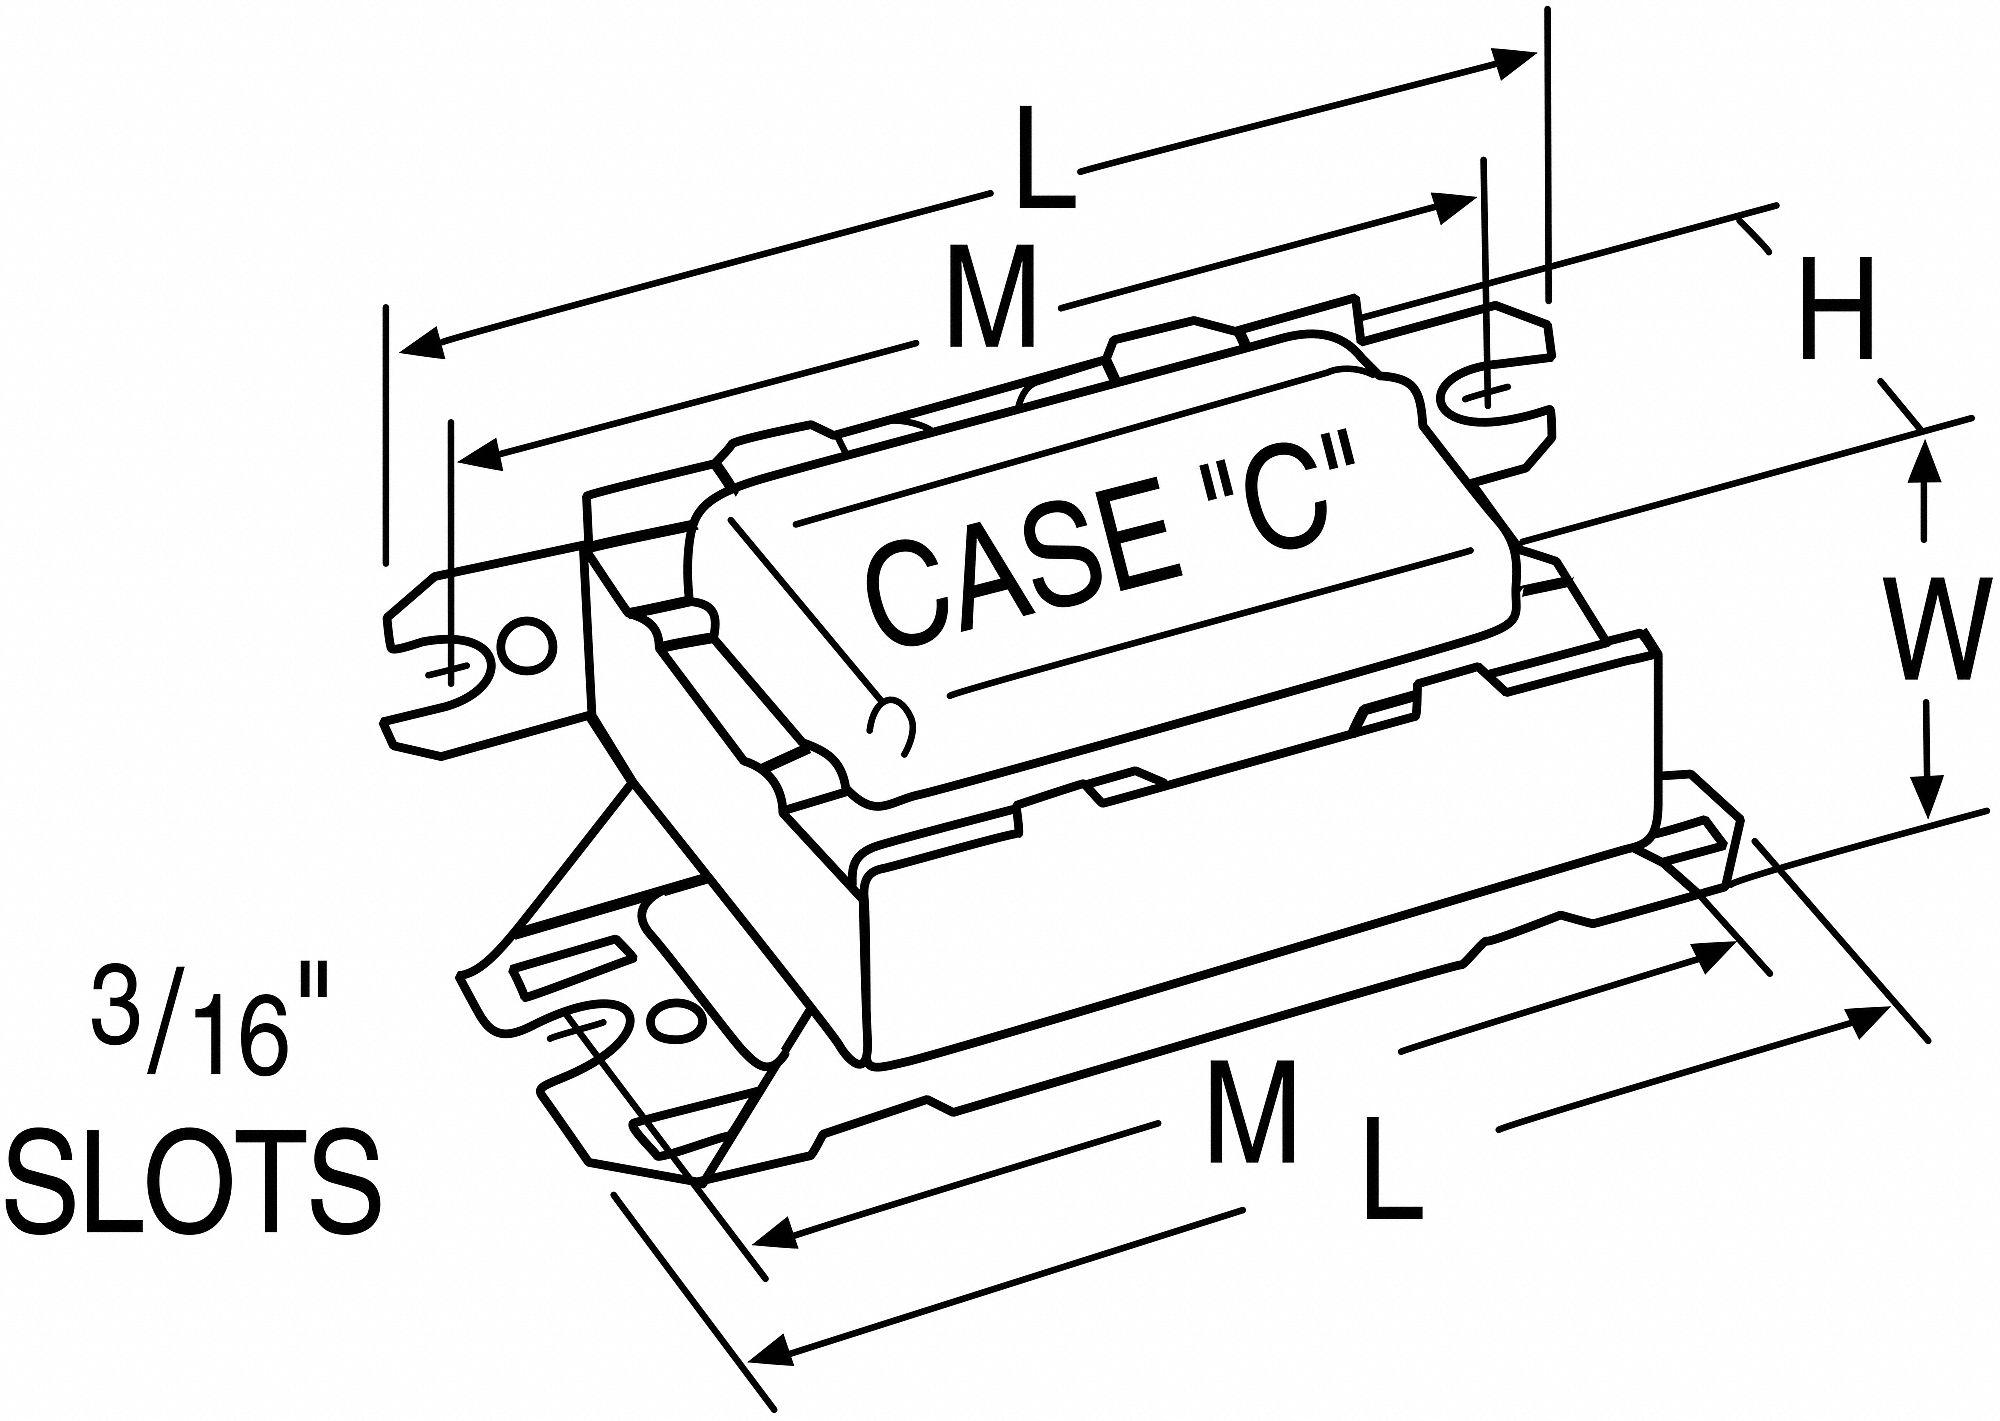 Lc 14 20 C Wiring Diagram : 25 Wiring Diagram Images